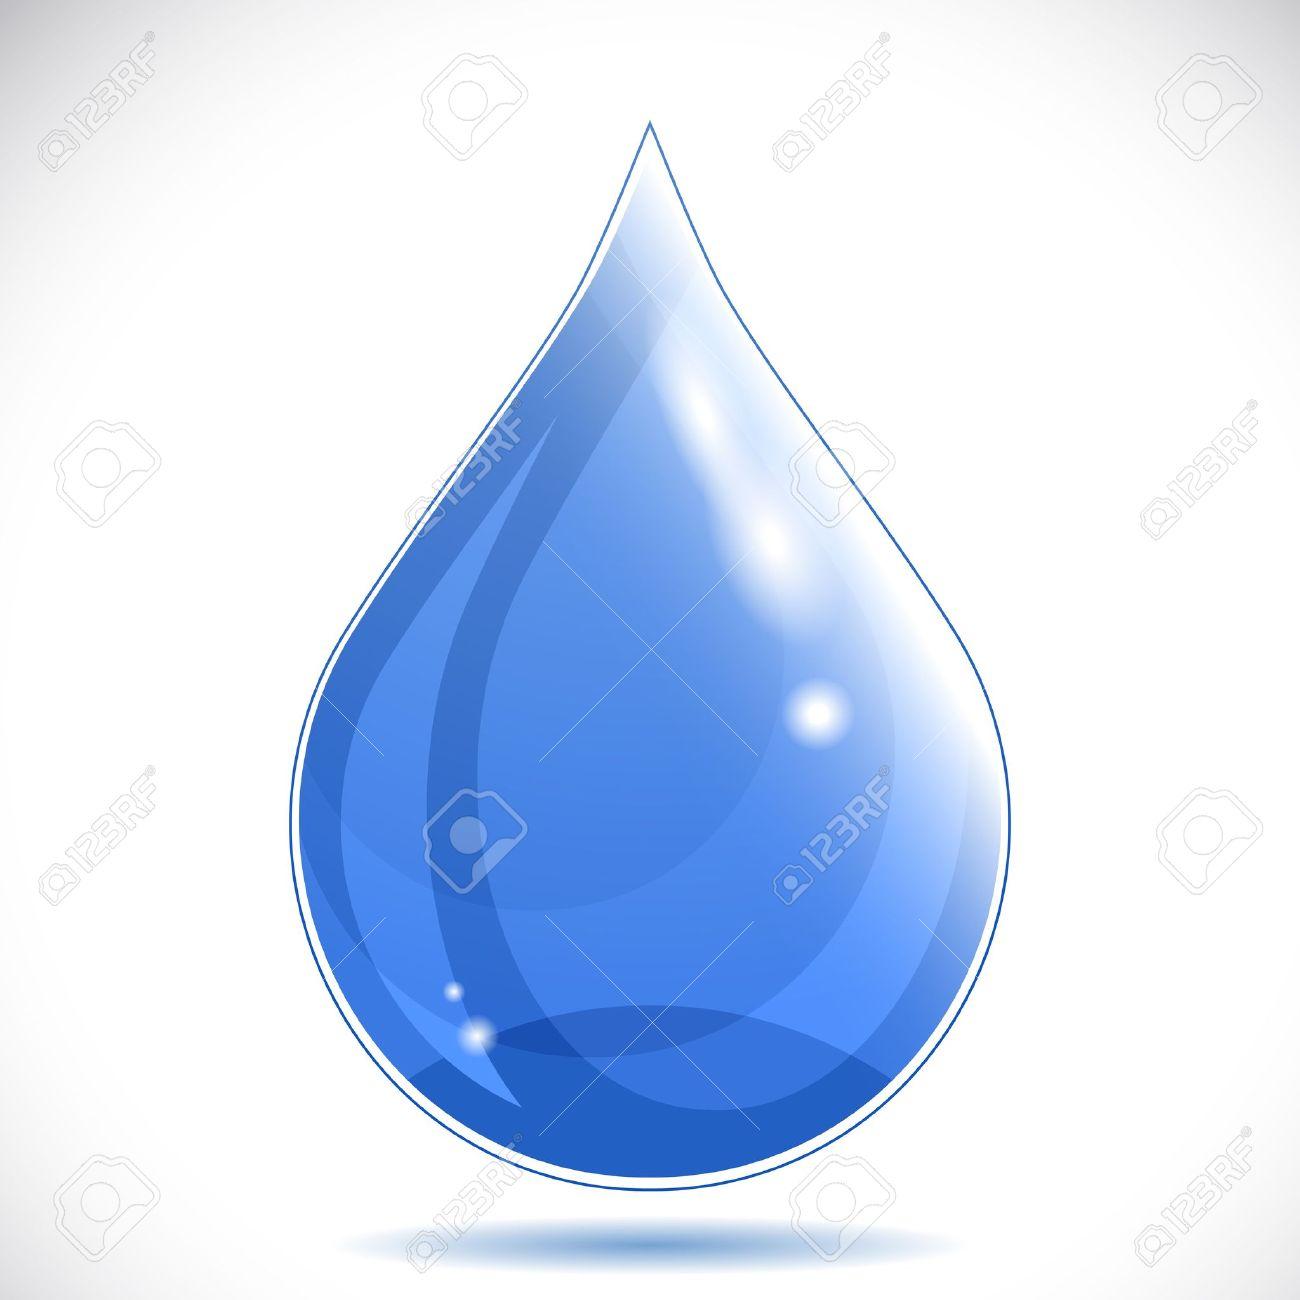 Water drop - vector illustration. Stock Vector - 10113612